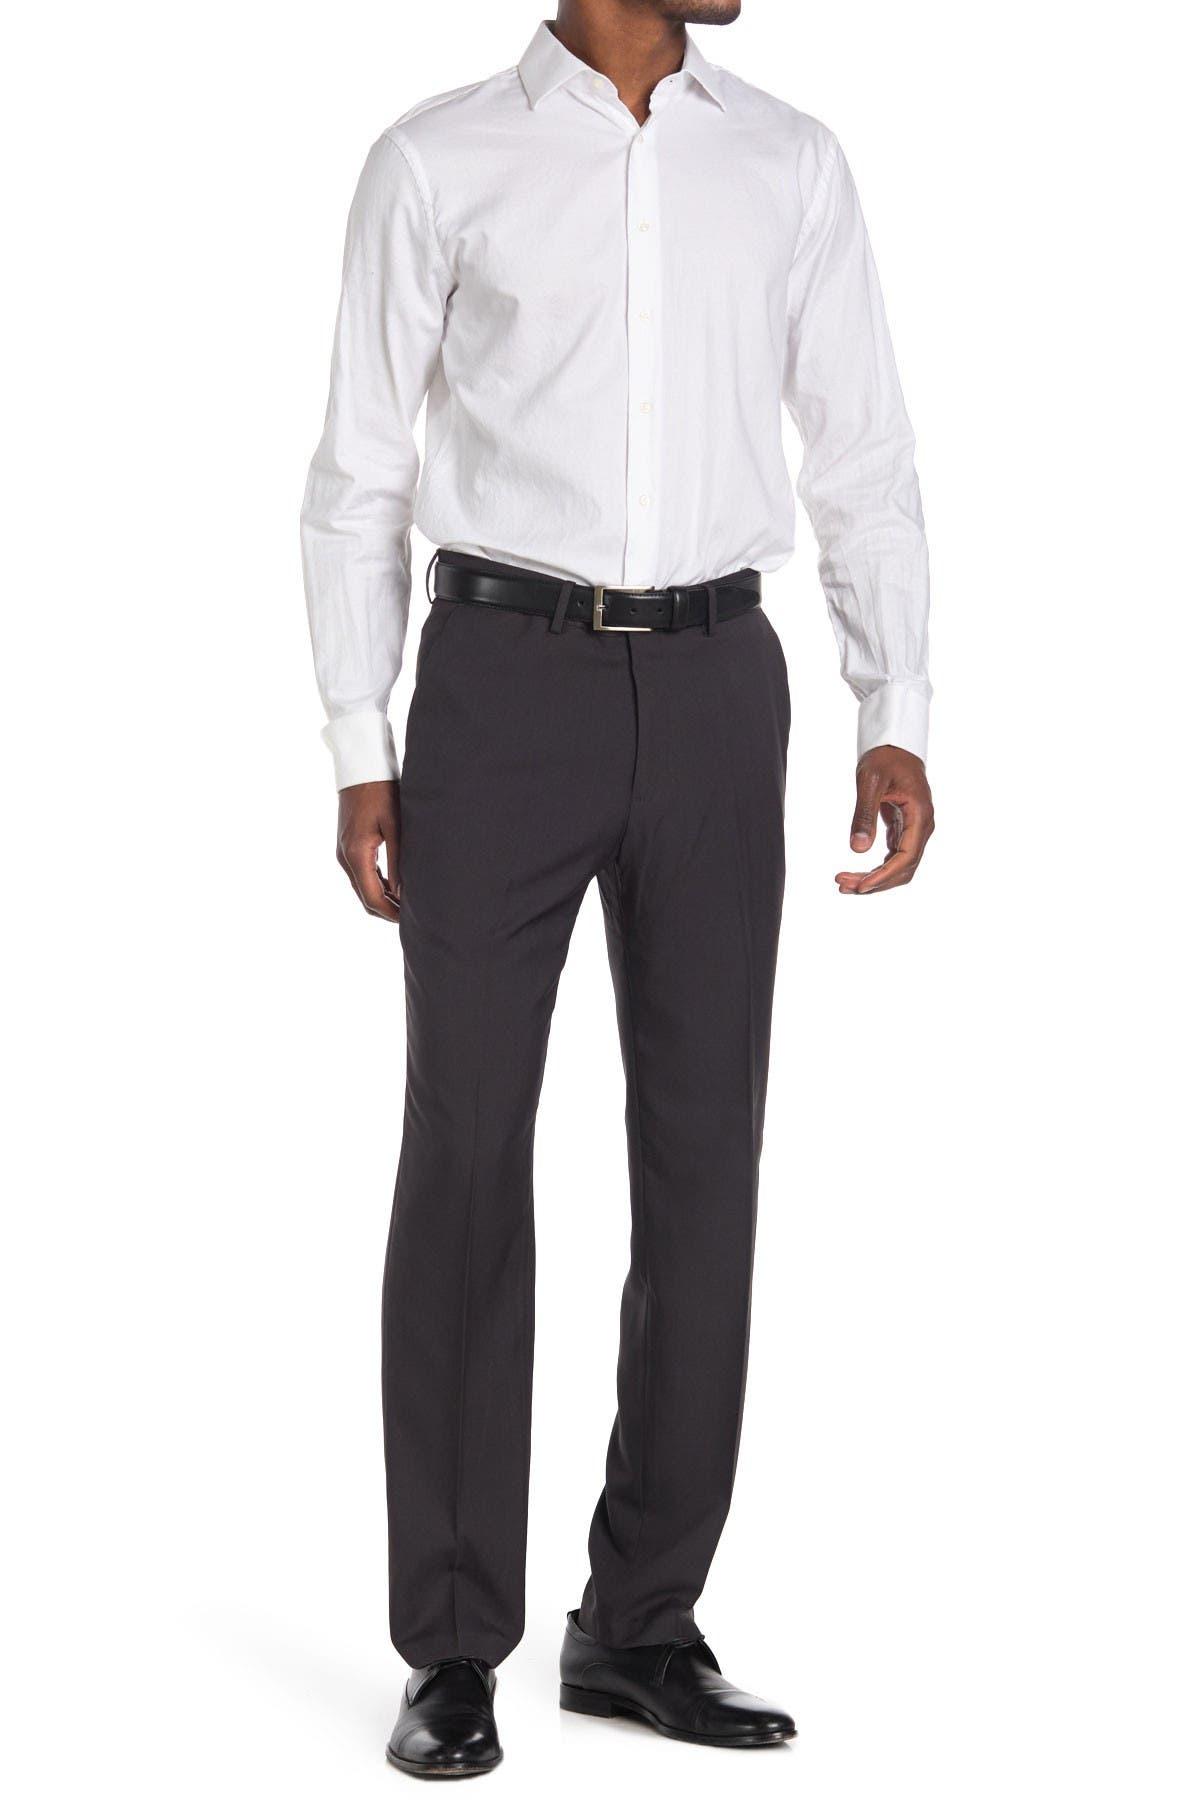 Image of HAGGAR Comfort Stretch Straight Cut Pants